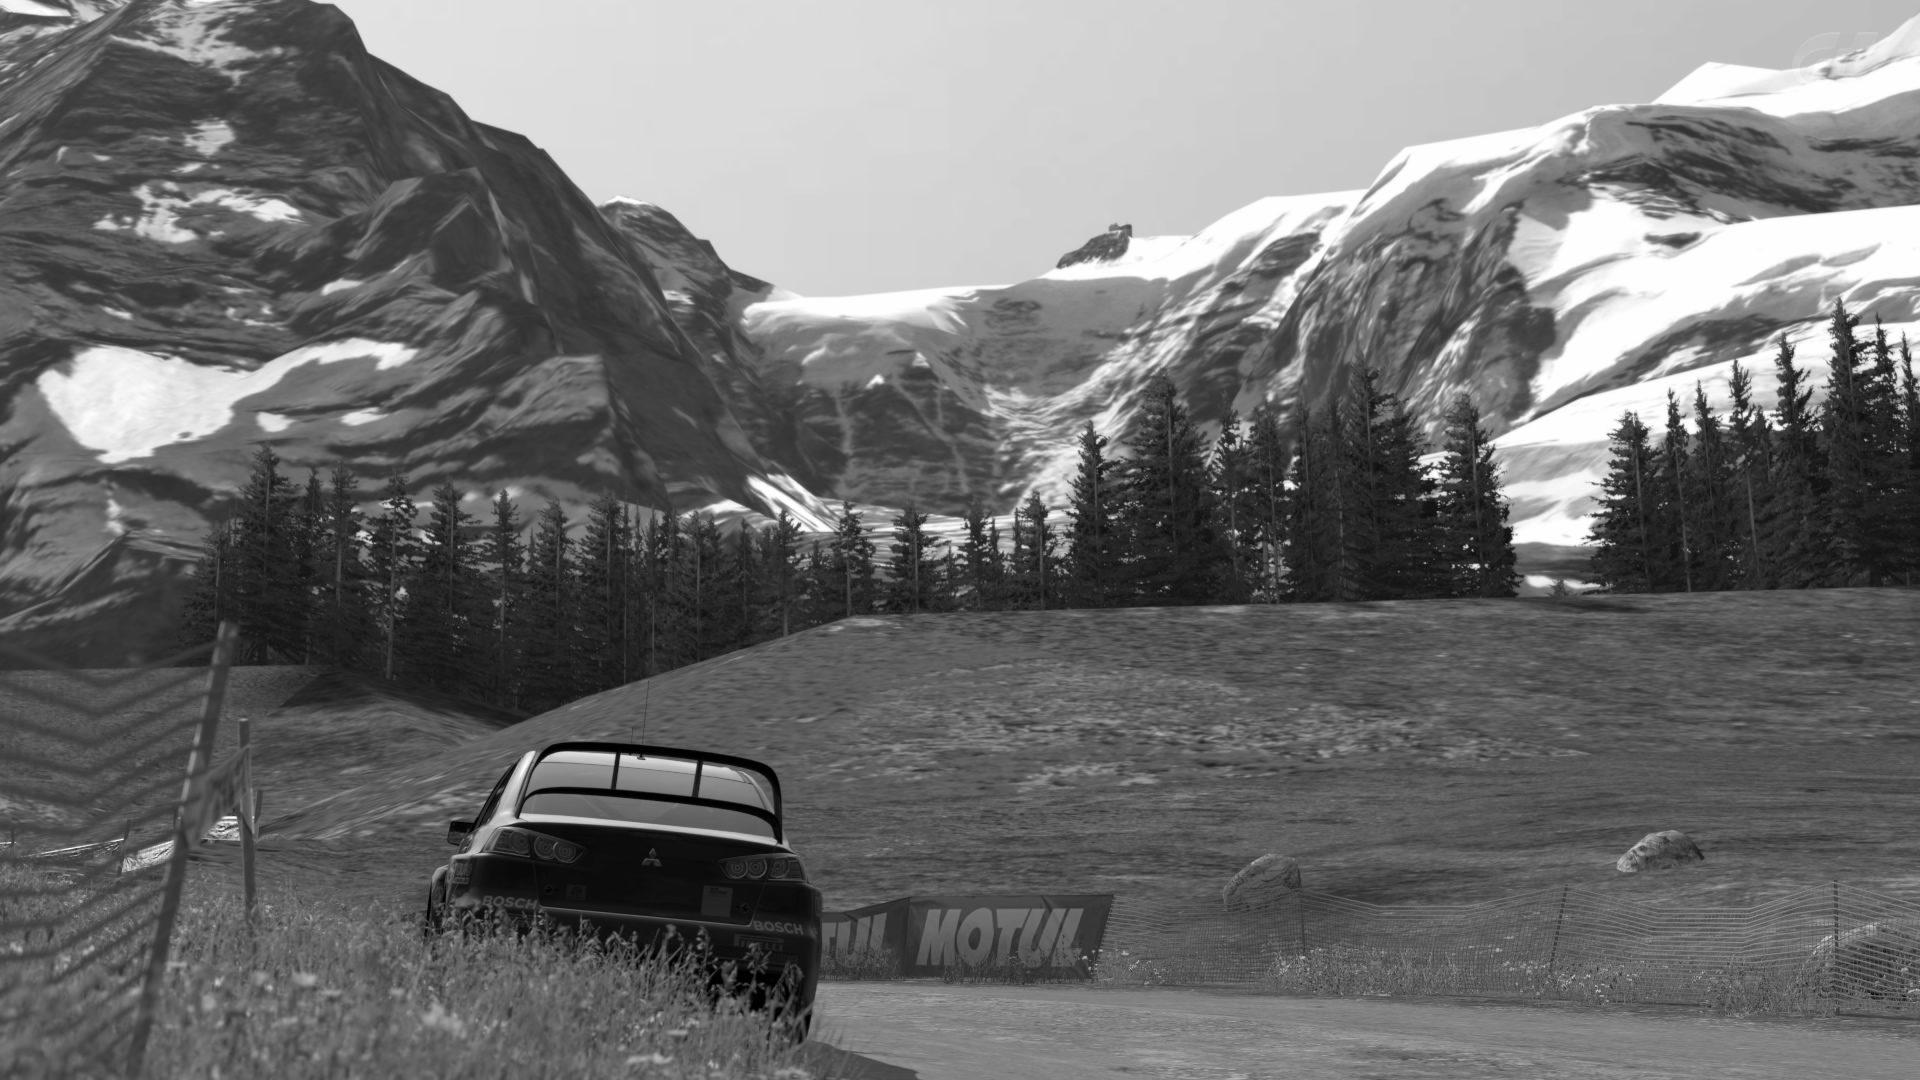 Eiger Nordwand K Trail_1.jpg